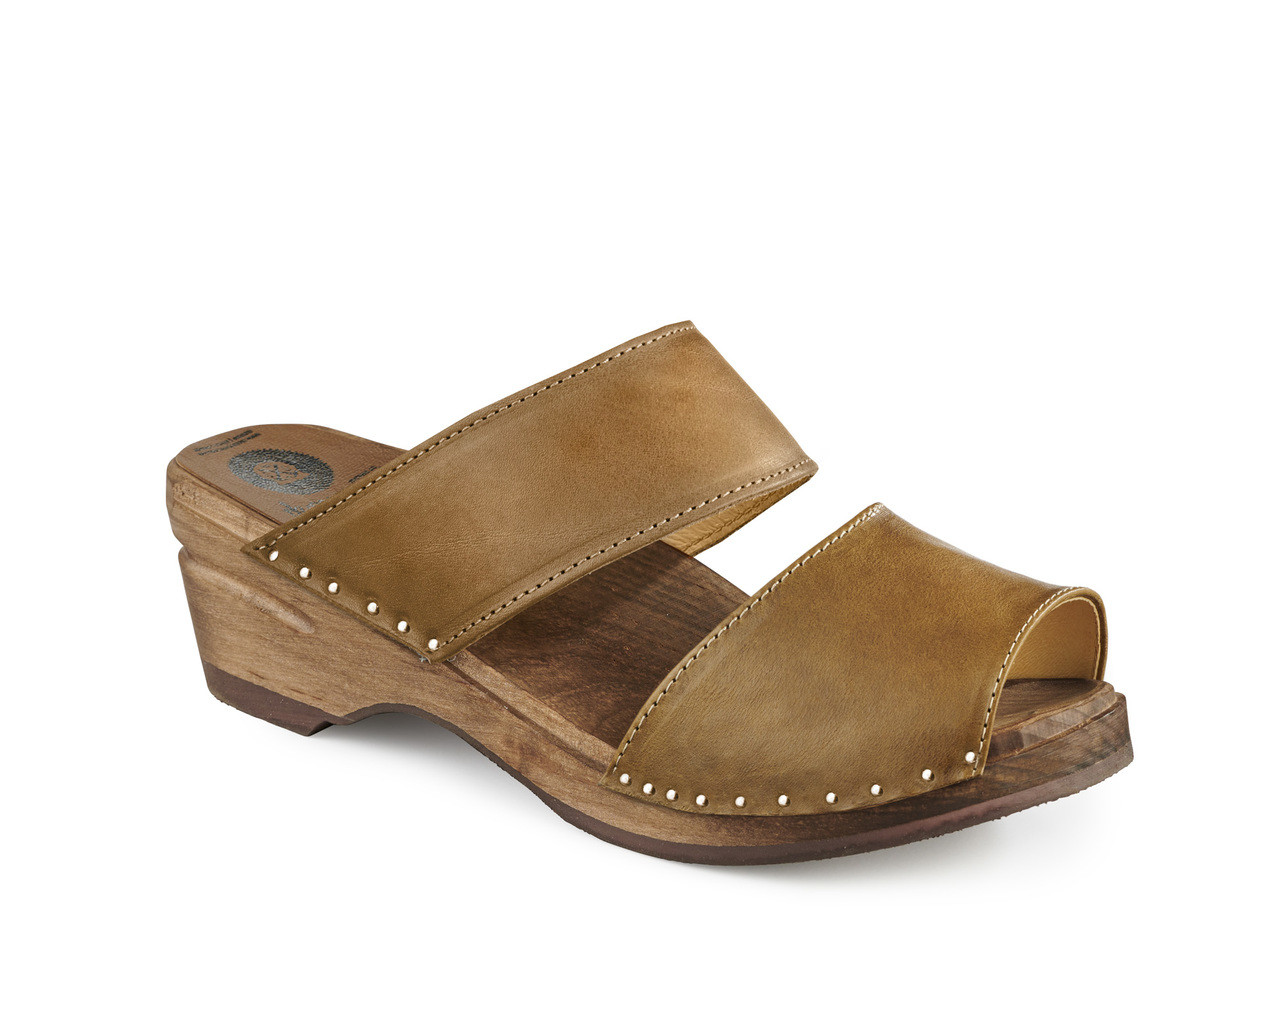 Karin Women's Sandals Original Sole Collection Clog Olive AjL54R